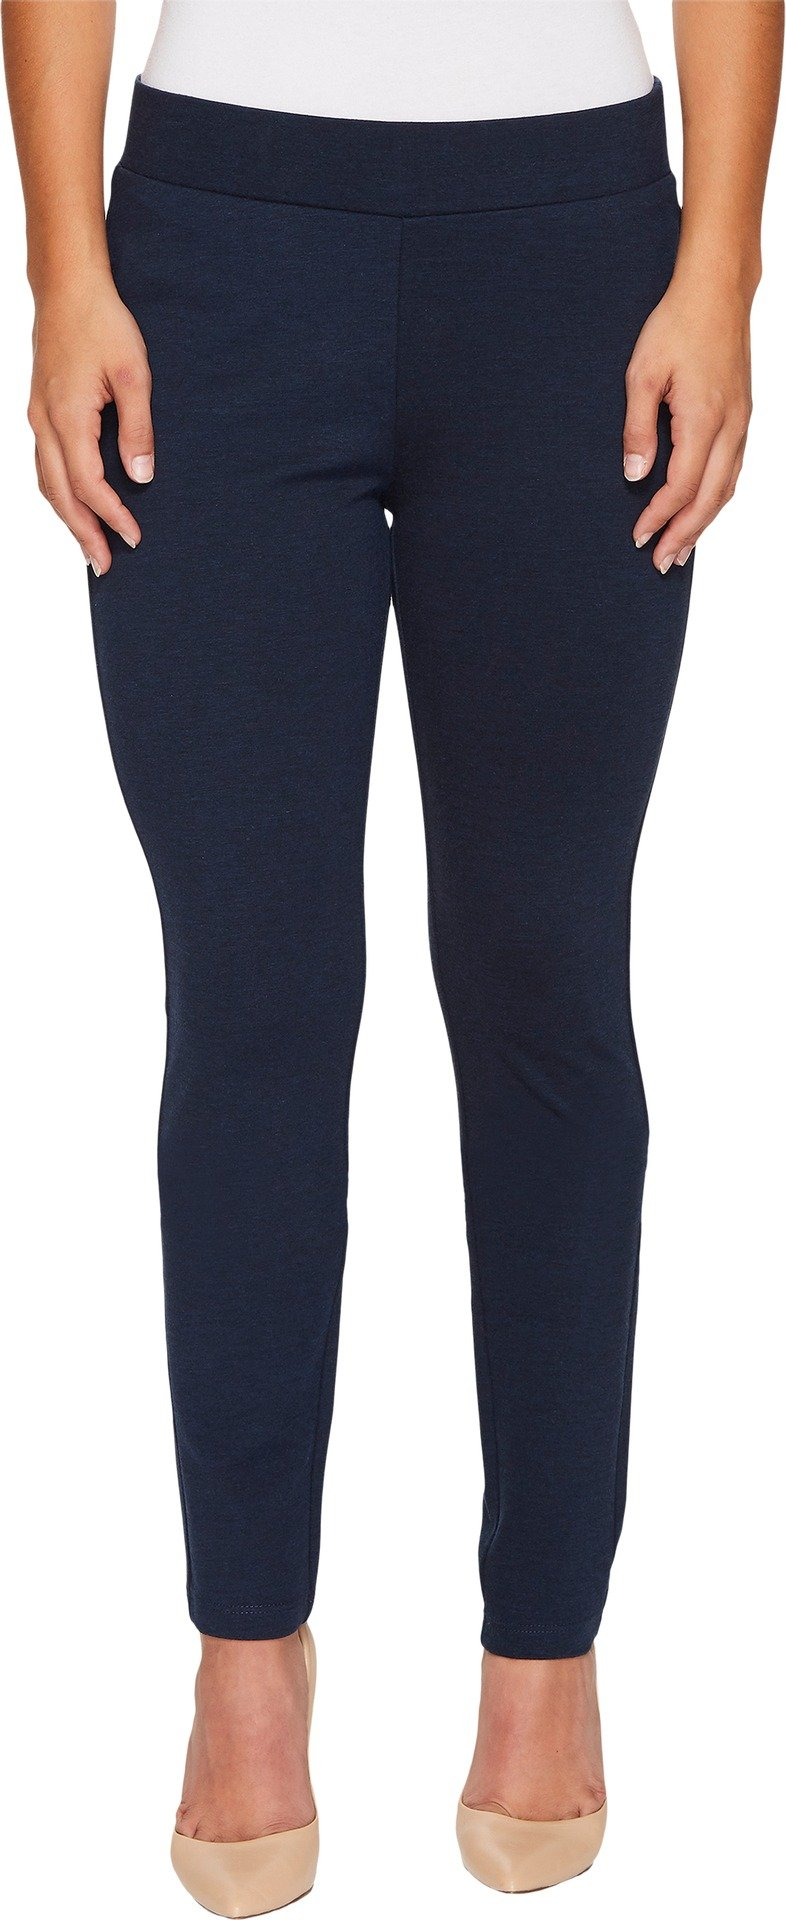 NYDJ Women's Petite Size Basic Pull on Ponte Knit Leggings, Peacoat Heather, 18P